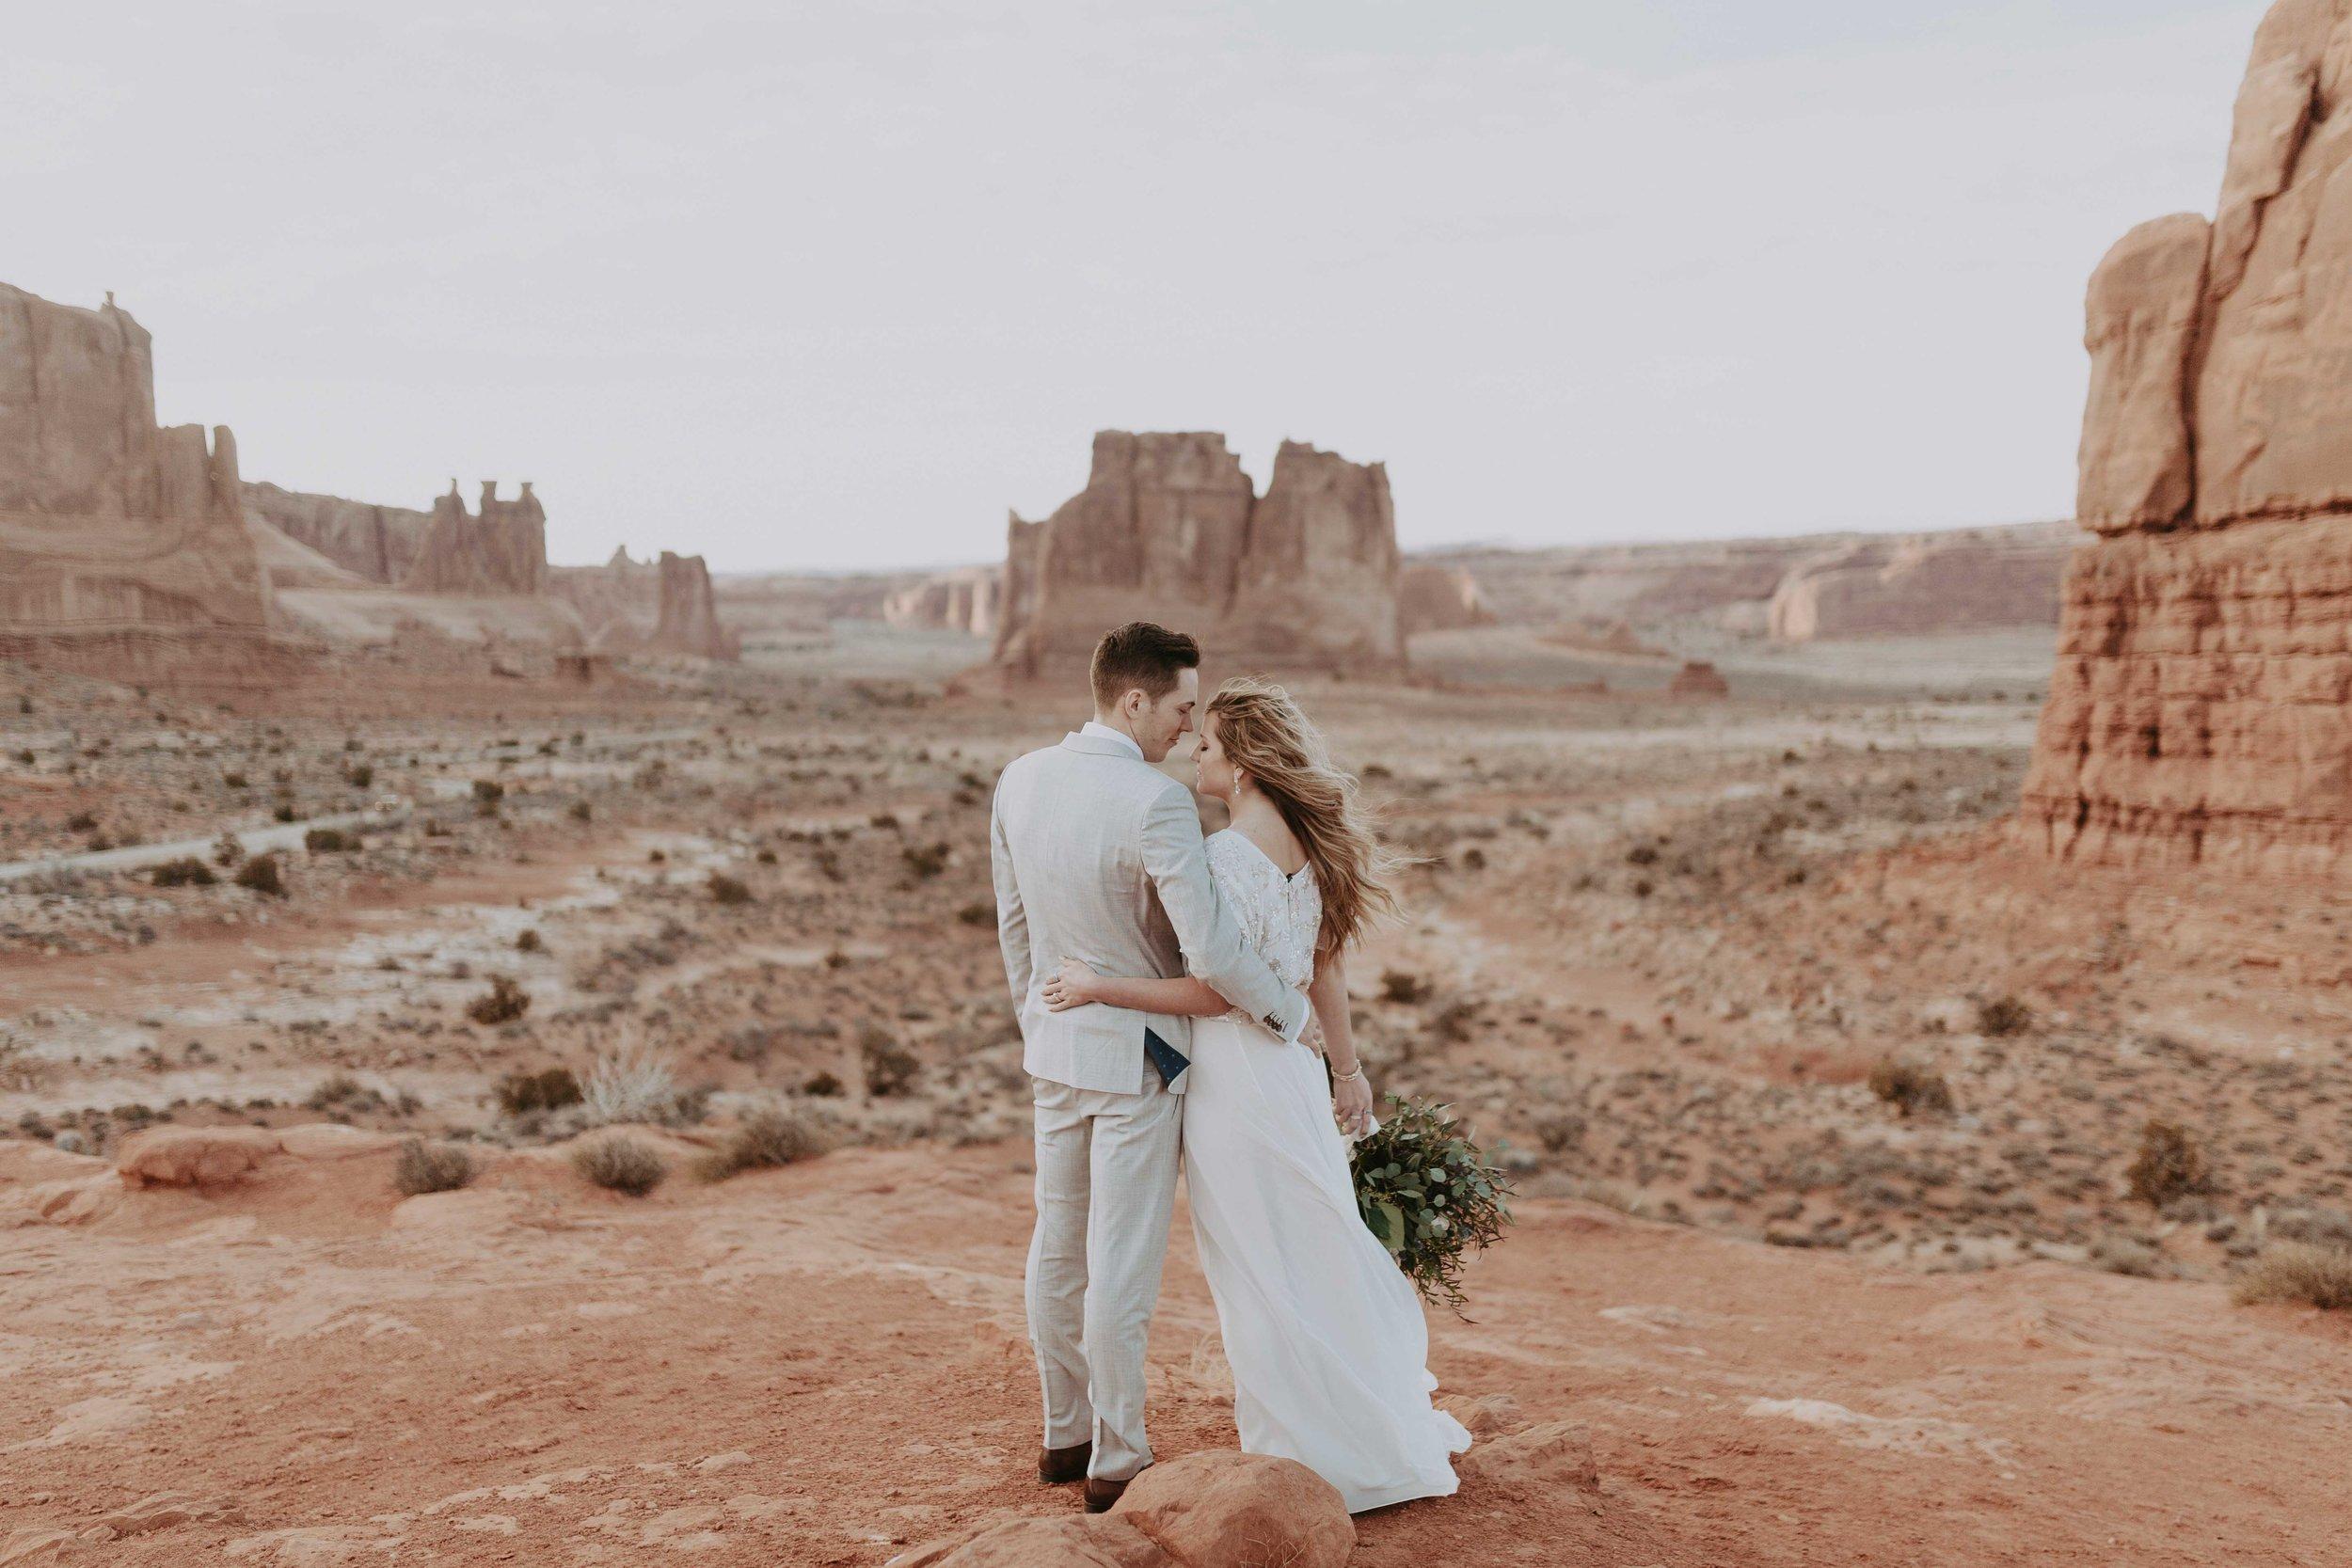 moab-wedding-photographer-45.jpg